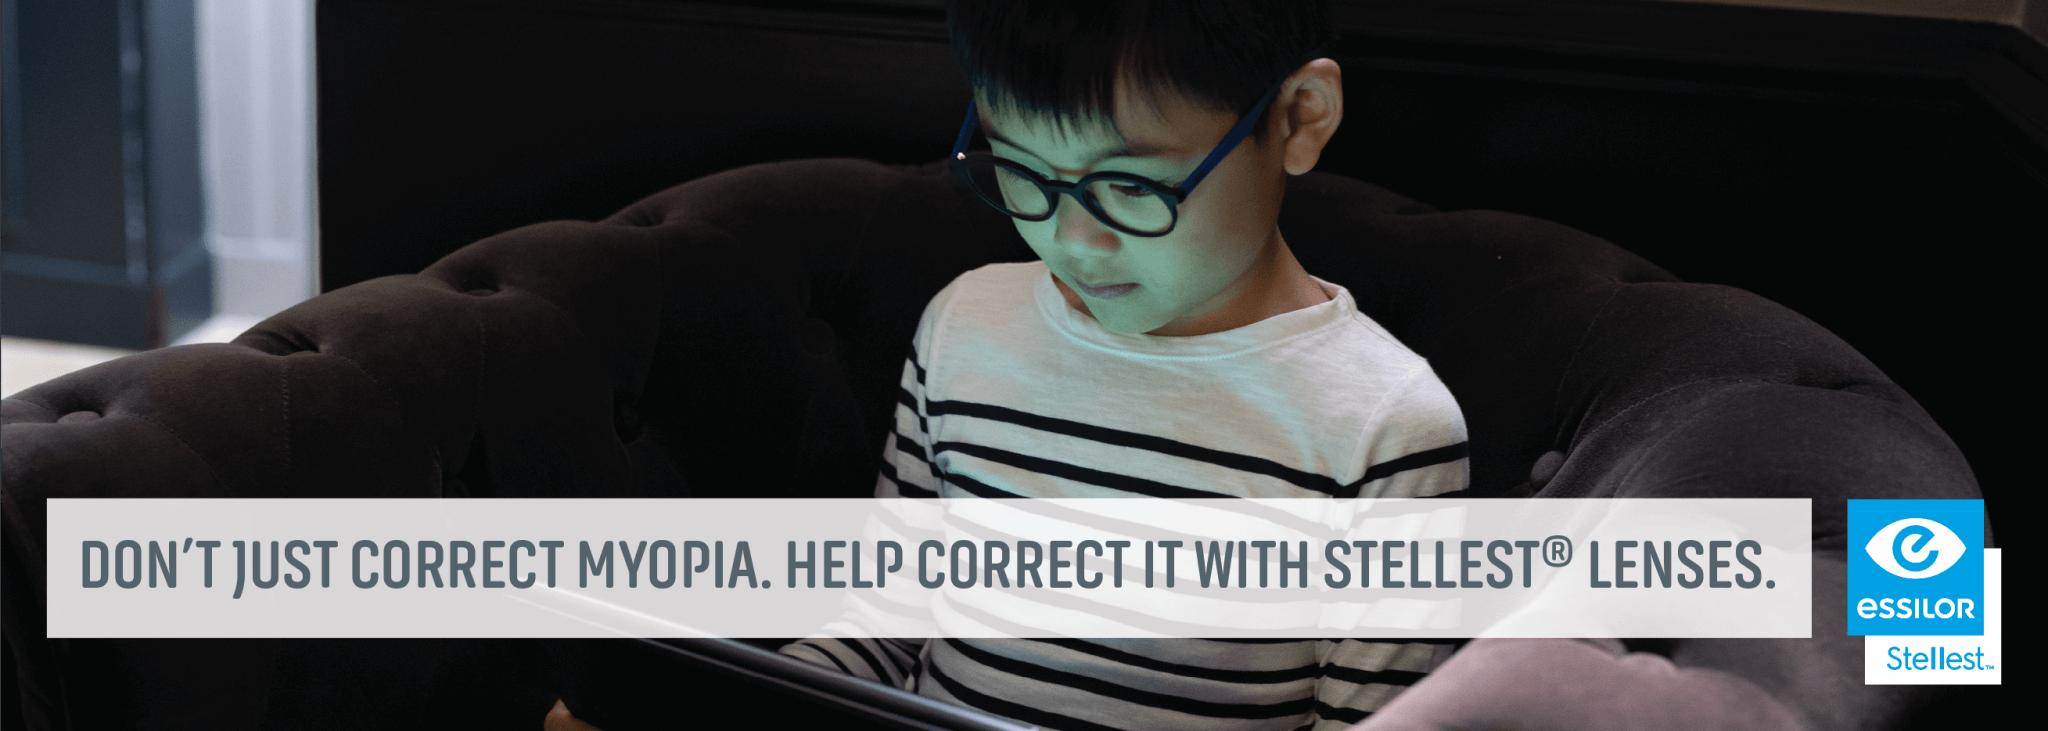 Help Correct Myopia With Stellest Lenses